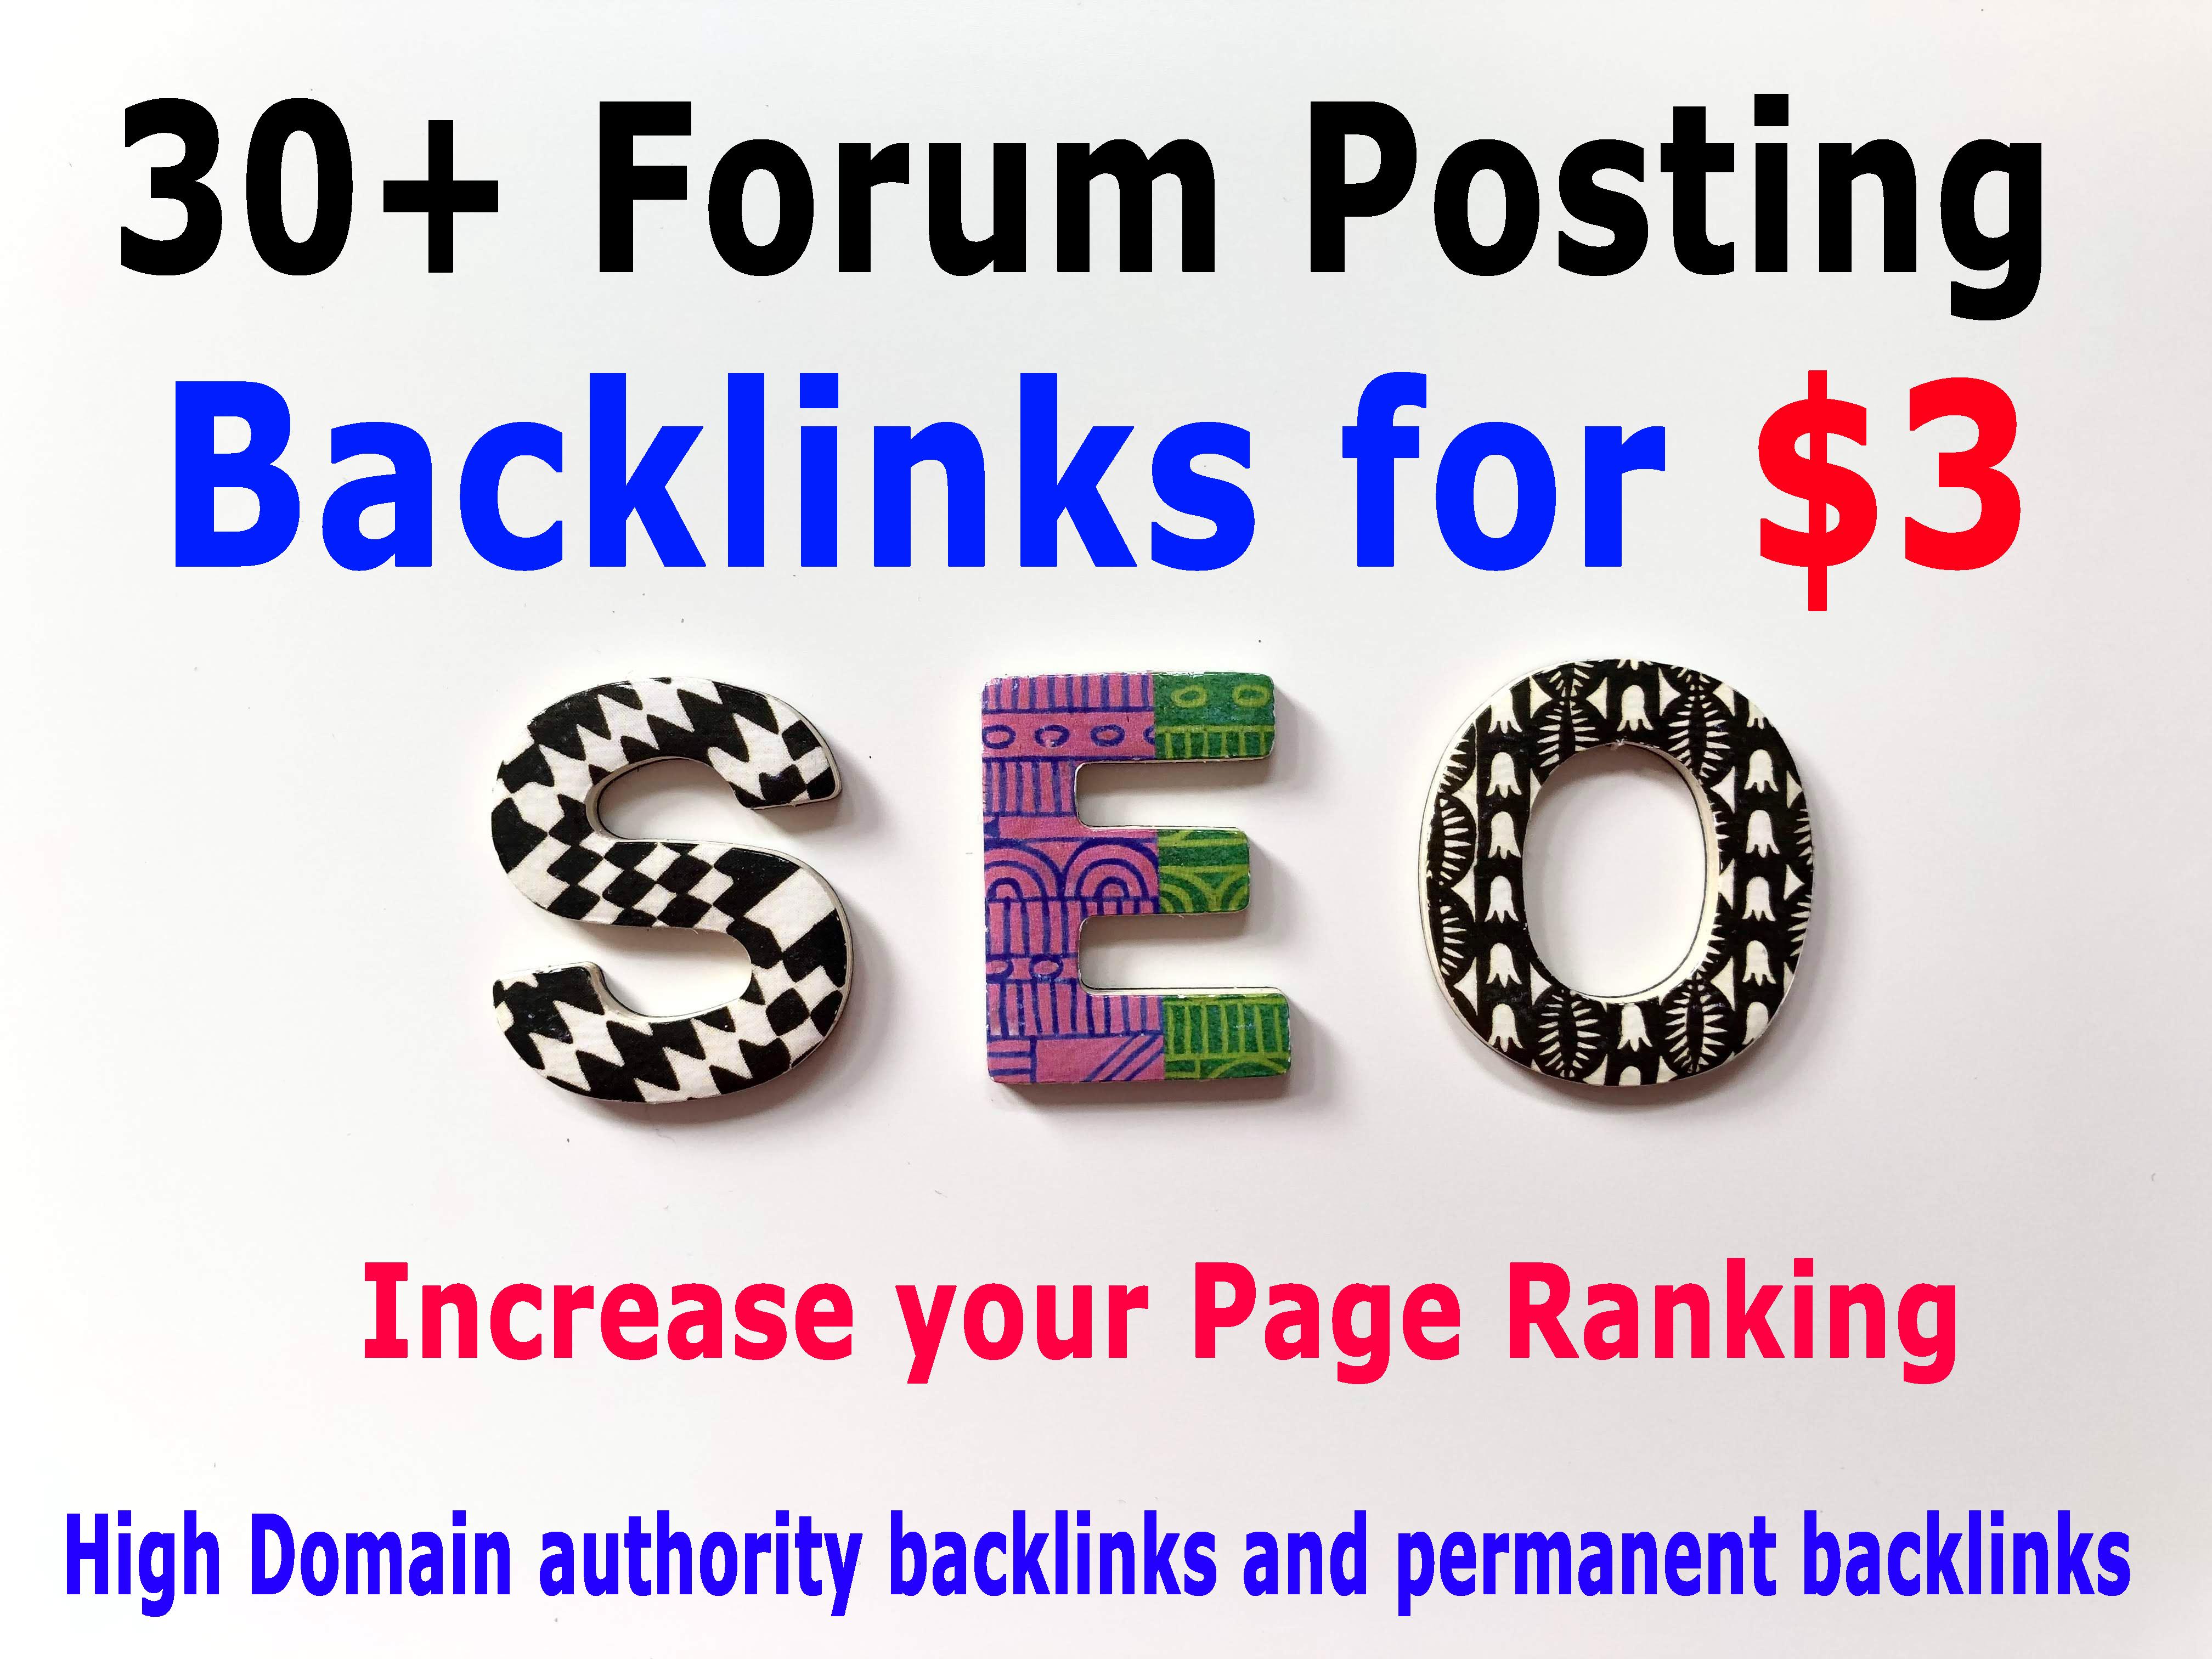 I will build 30+ quality forum posting backlinks